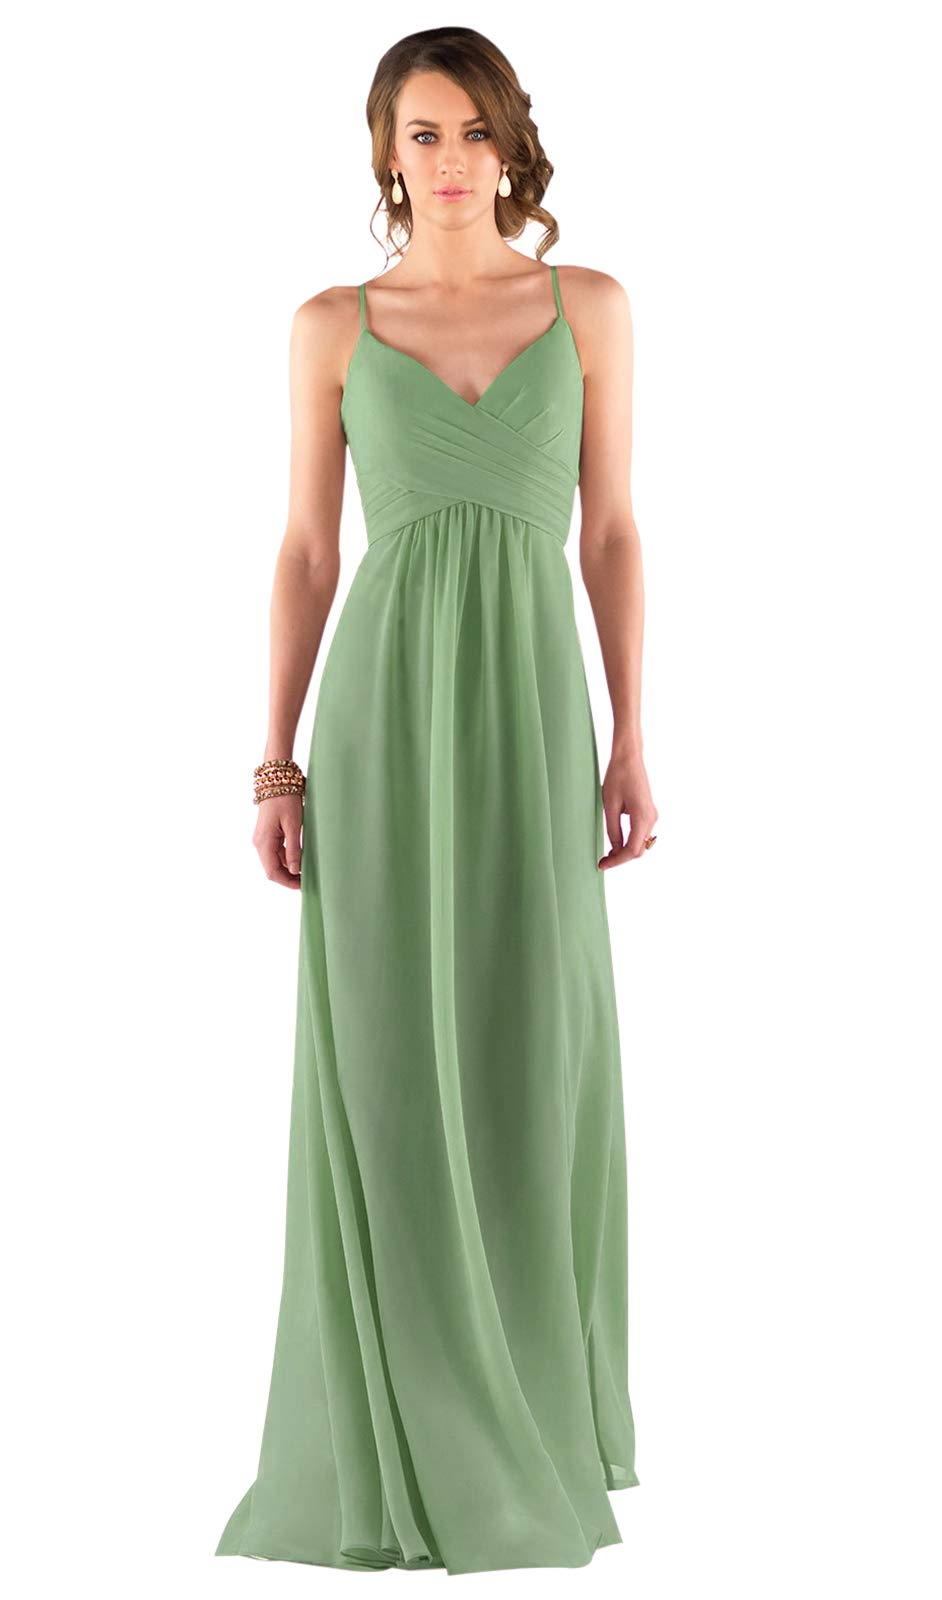 0644558a82 Zhongde Women's Spaghetti Strap V Neck Draped Chiffon Bridesmaid Dresses  Long Prom Dress Sage Green Size 8